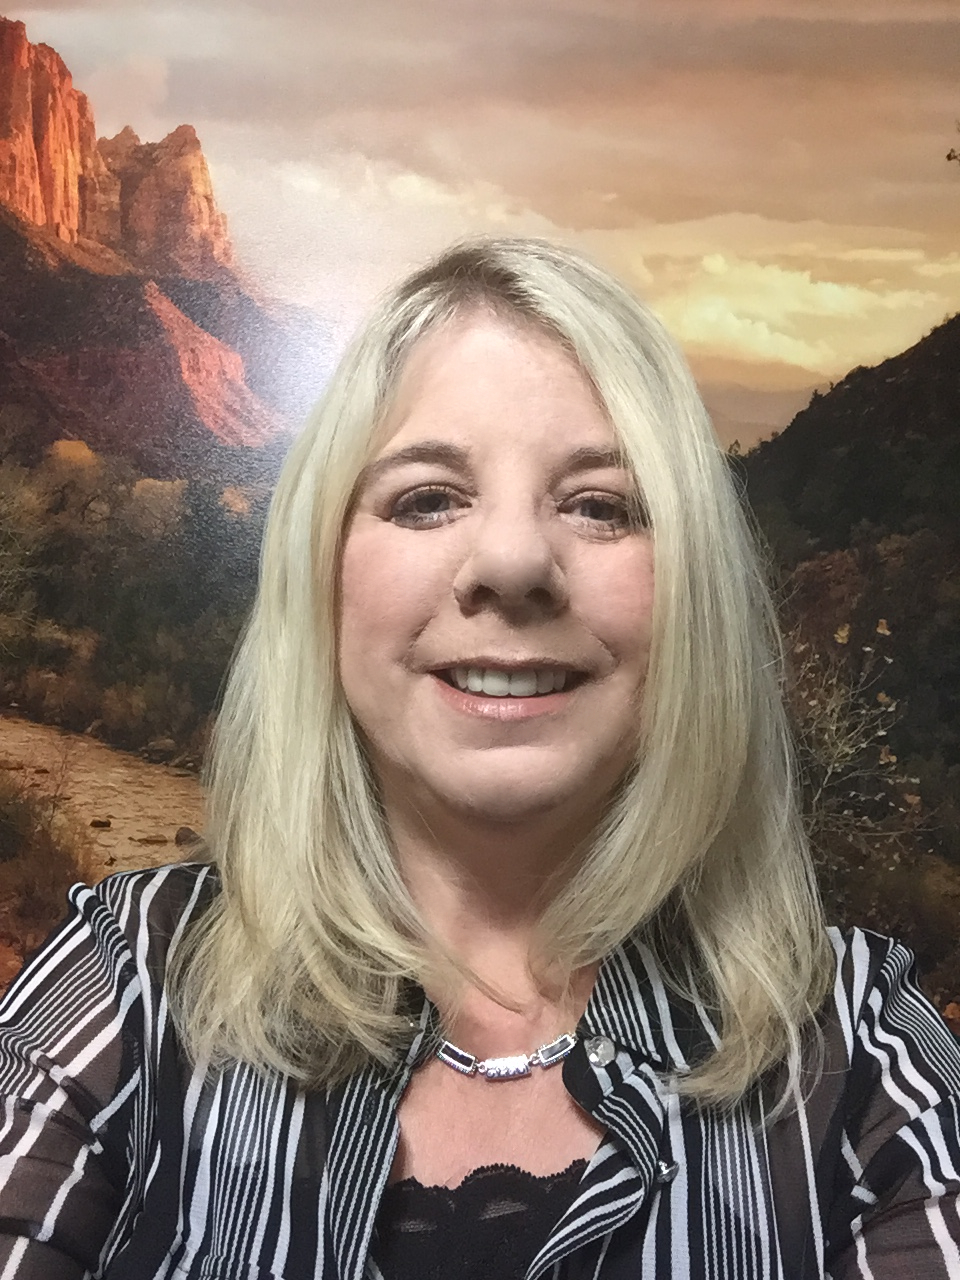 Marci Porter